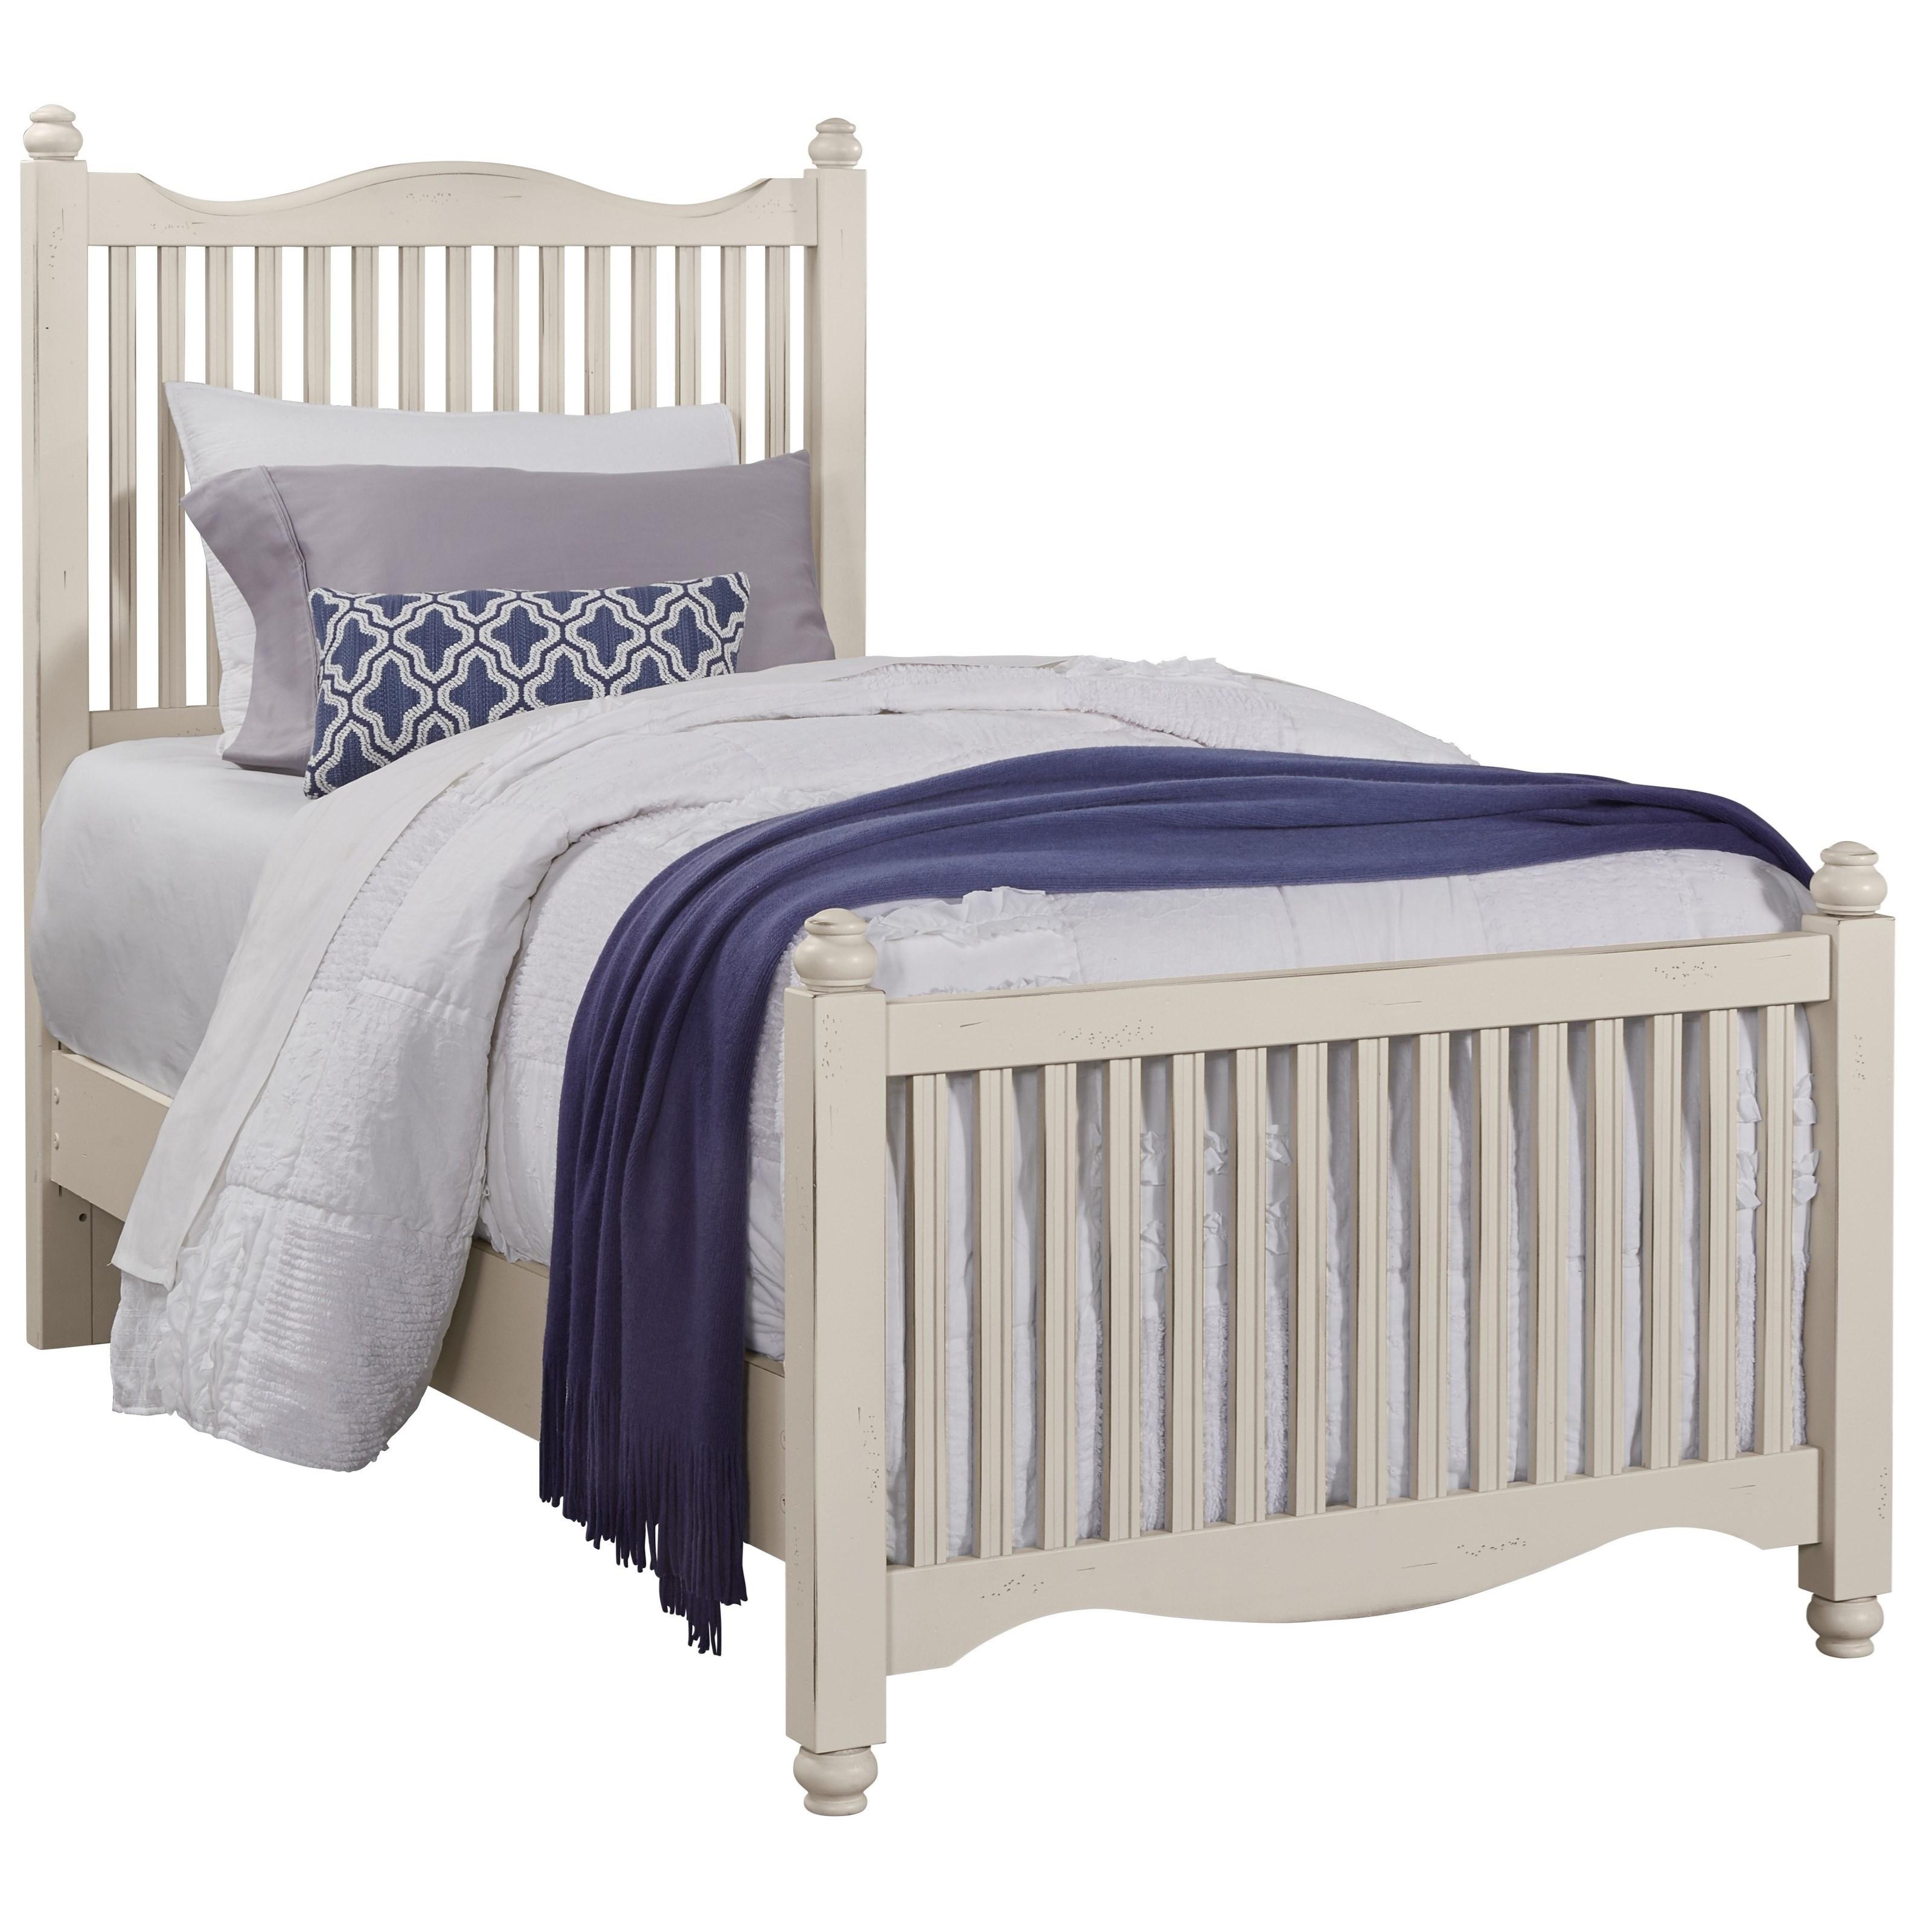 Vaughan Bassett American Maple Twin Slat Bed - Item Number: 404-377+773+900